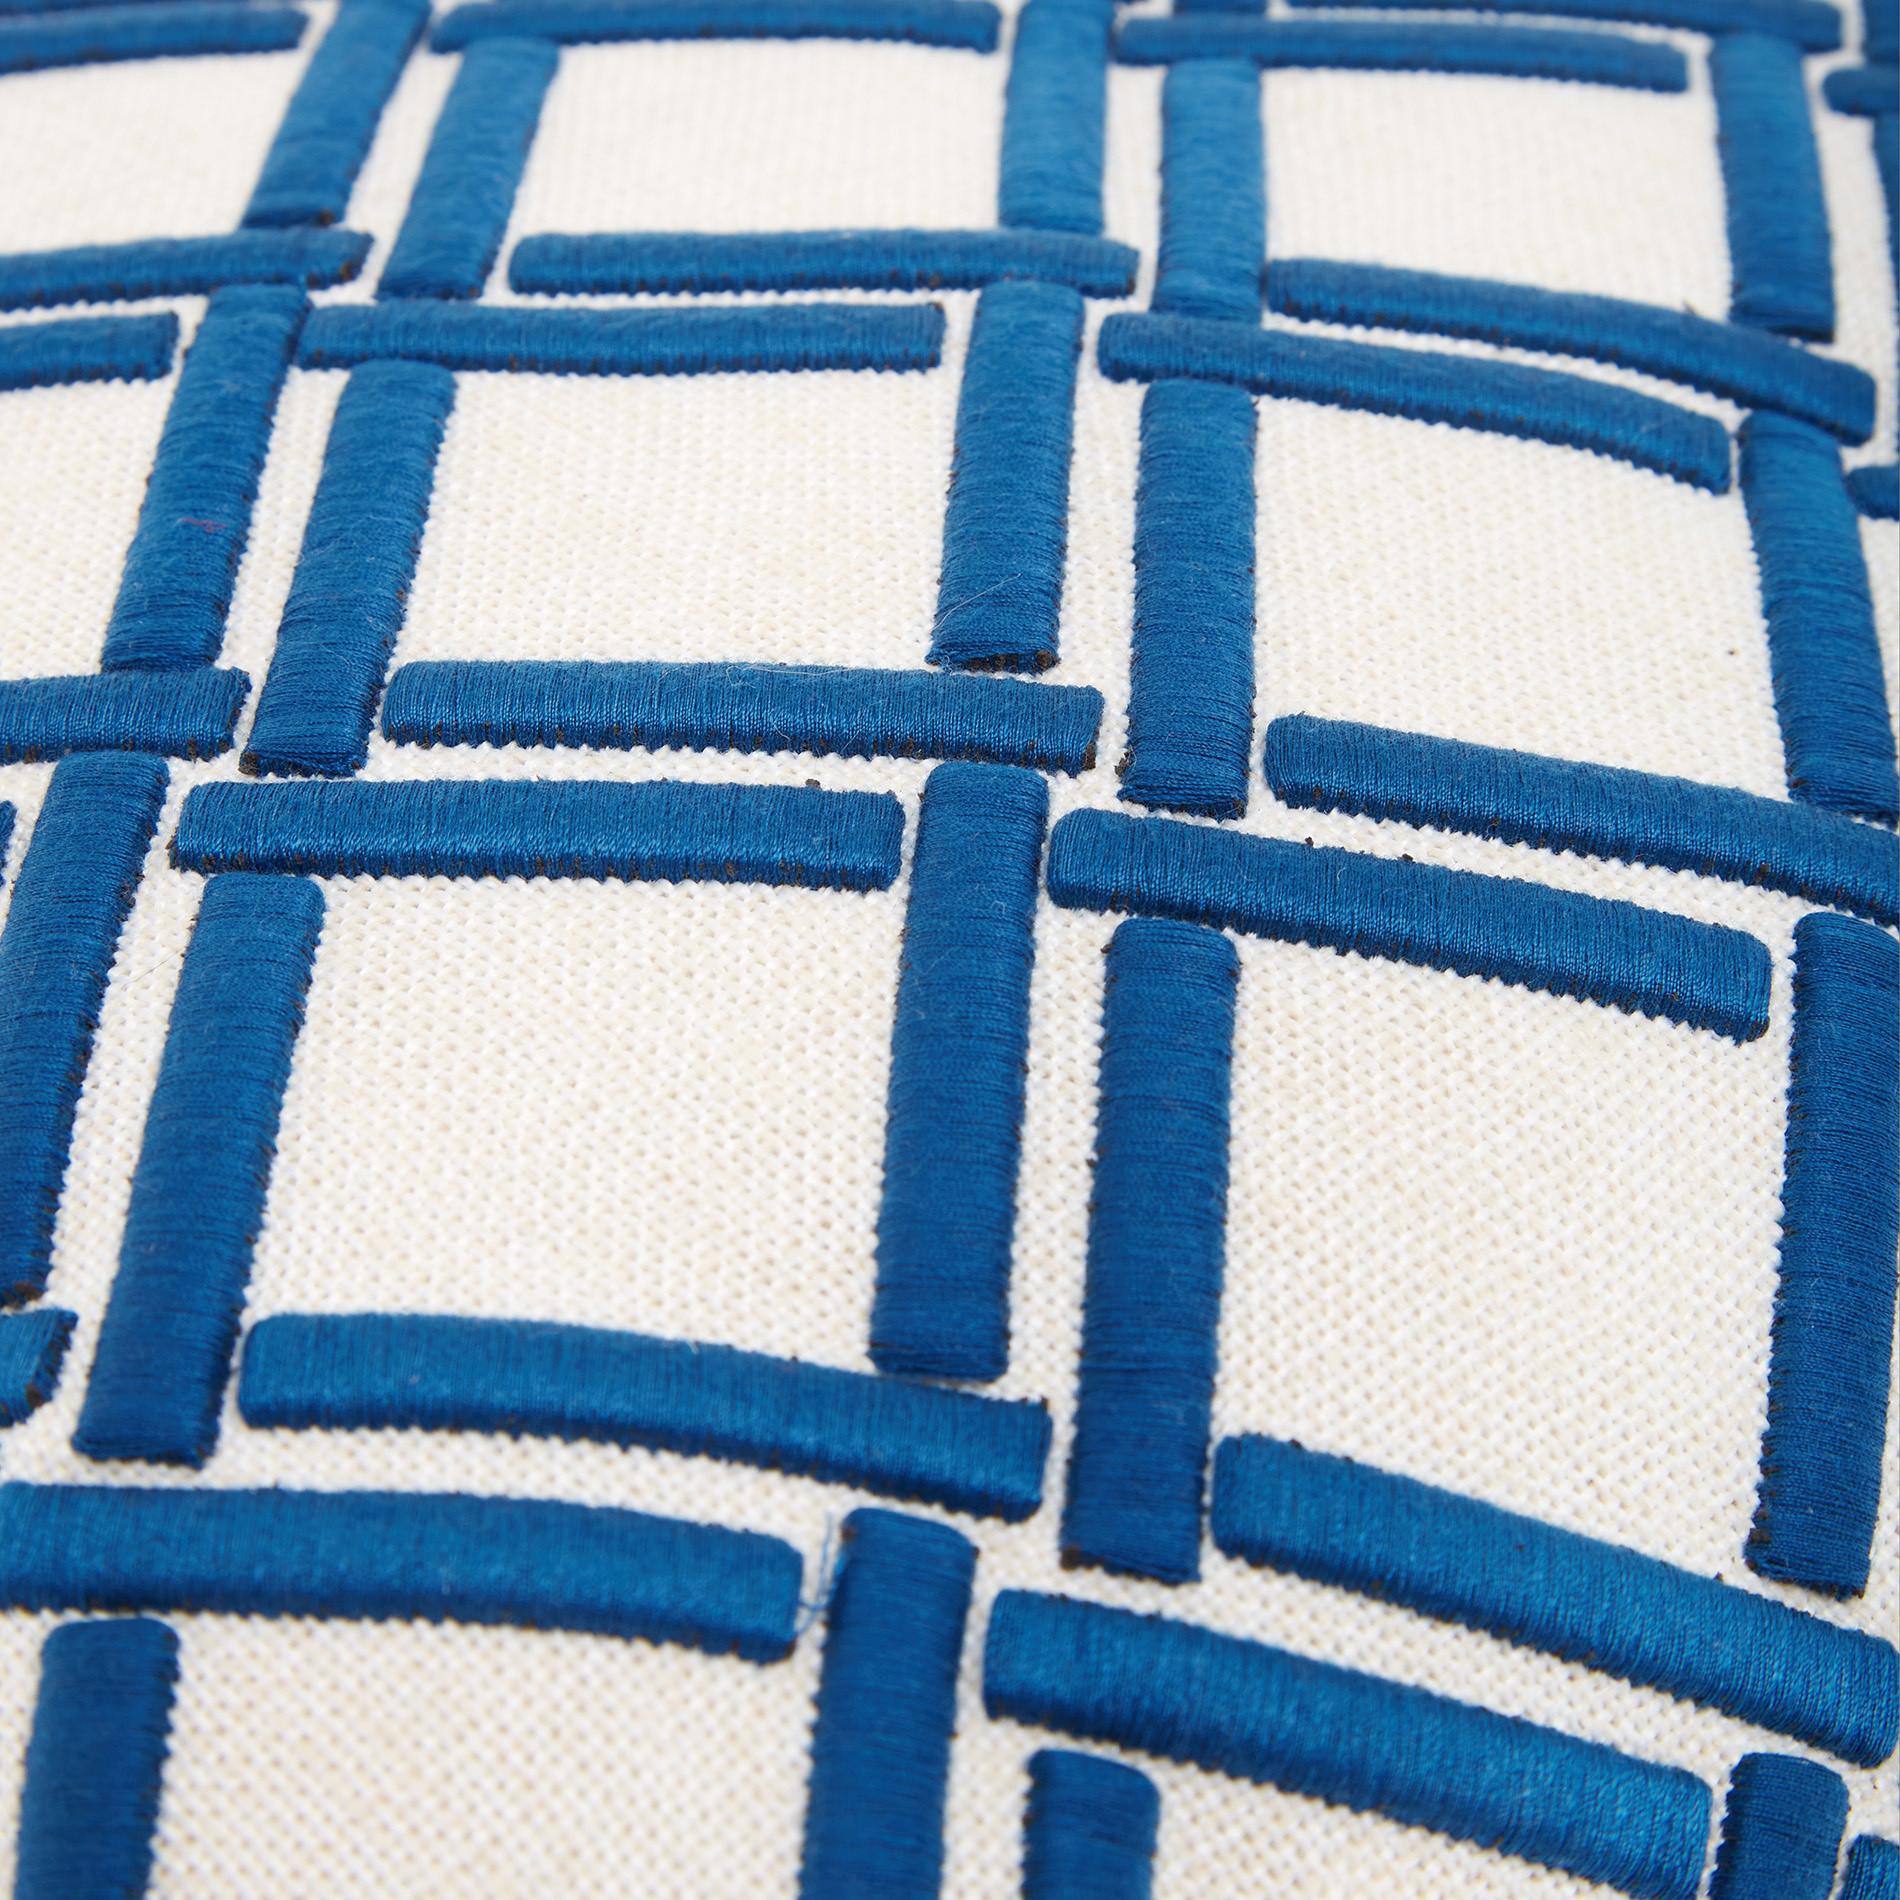 Cuscino intreccio applicato 45x45cm, Blu, large image number 2